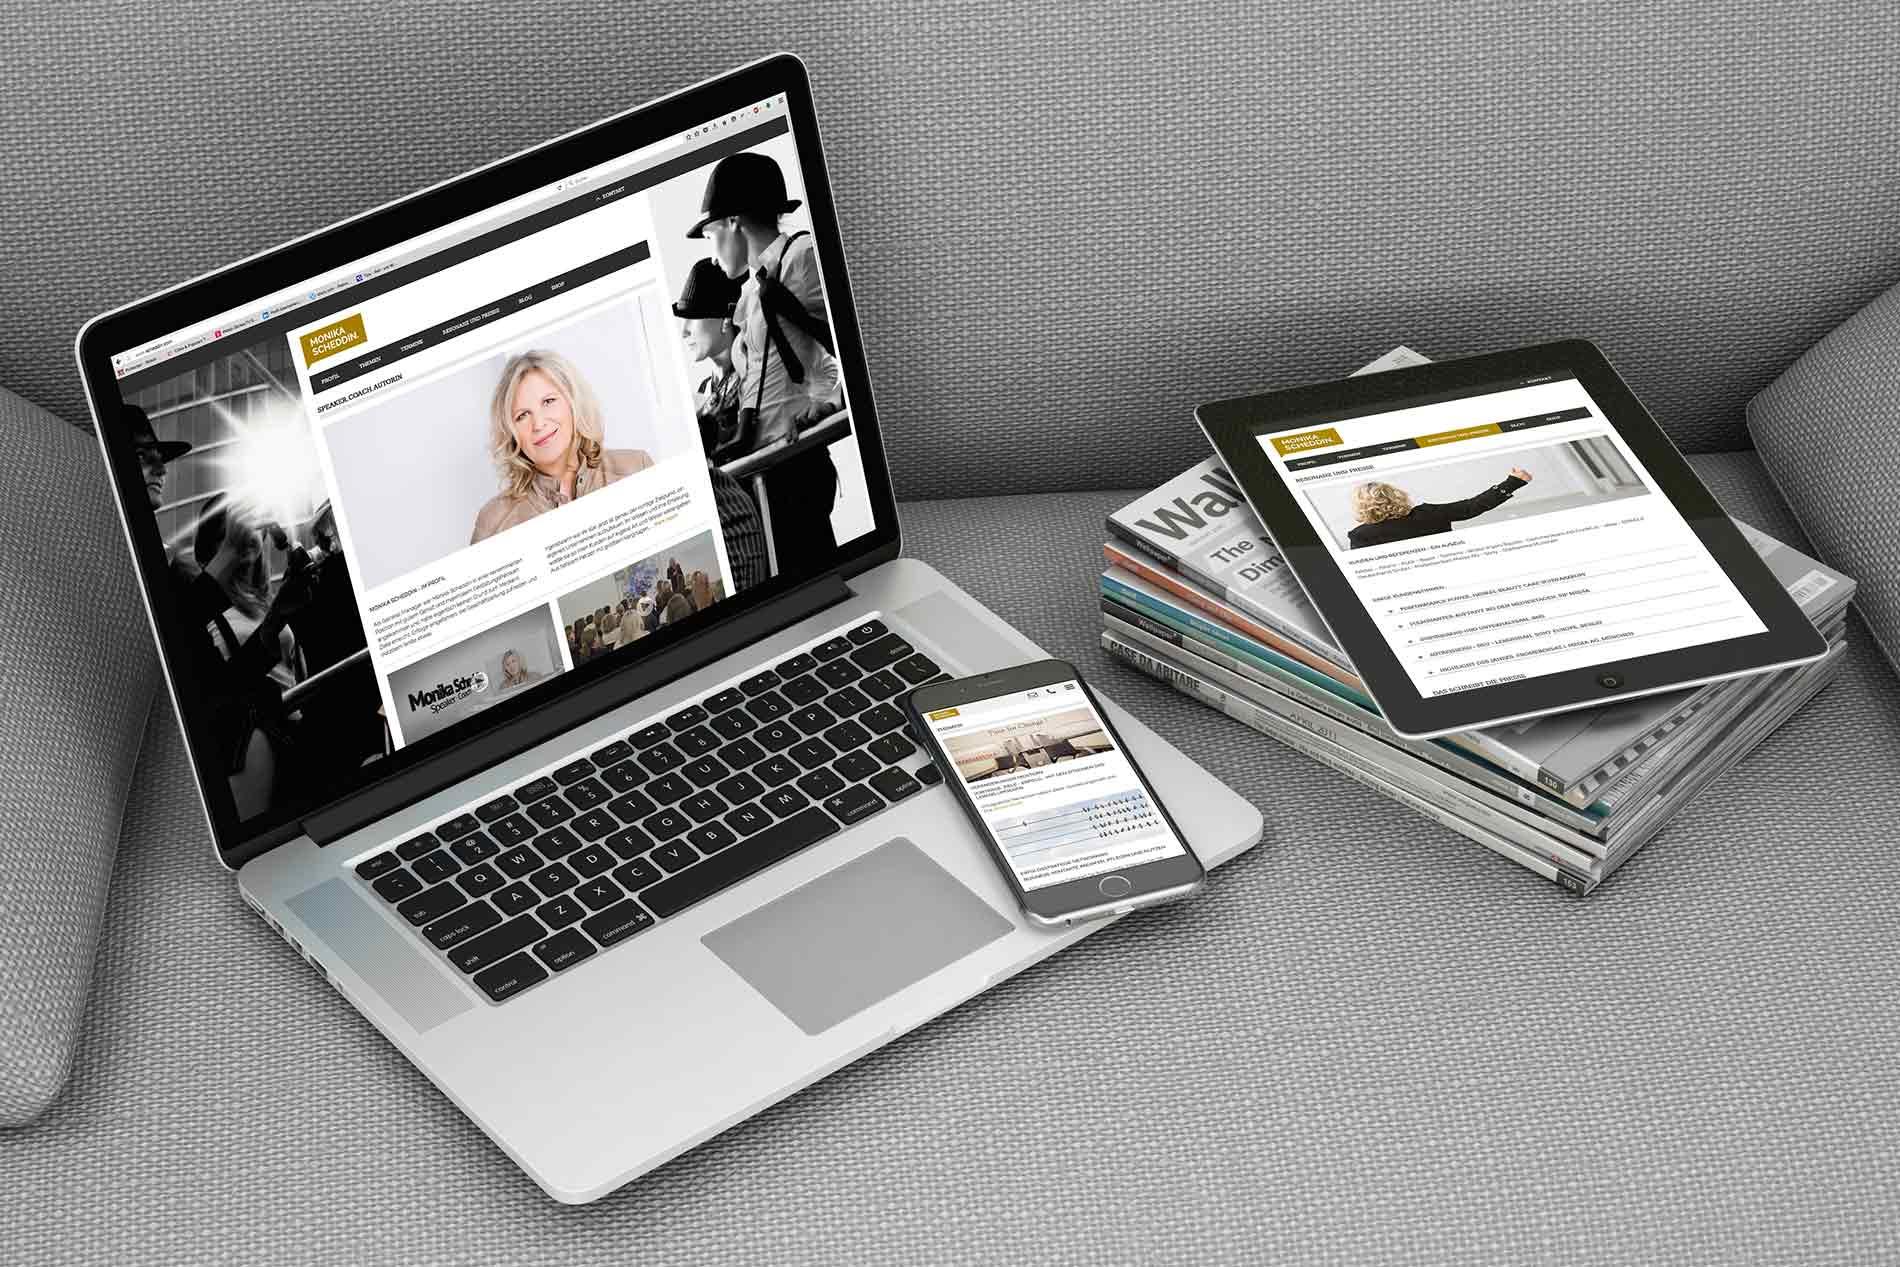 Janina-Lermer-Webseitengestaltung-Webdesign-Coach-Monika-Scheddin